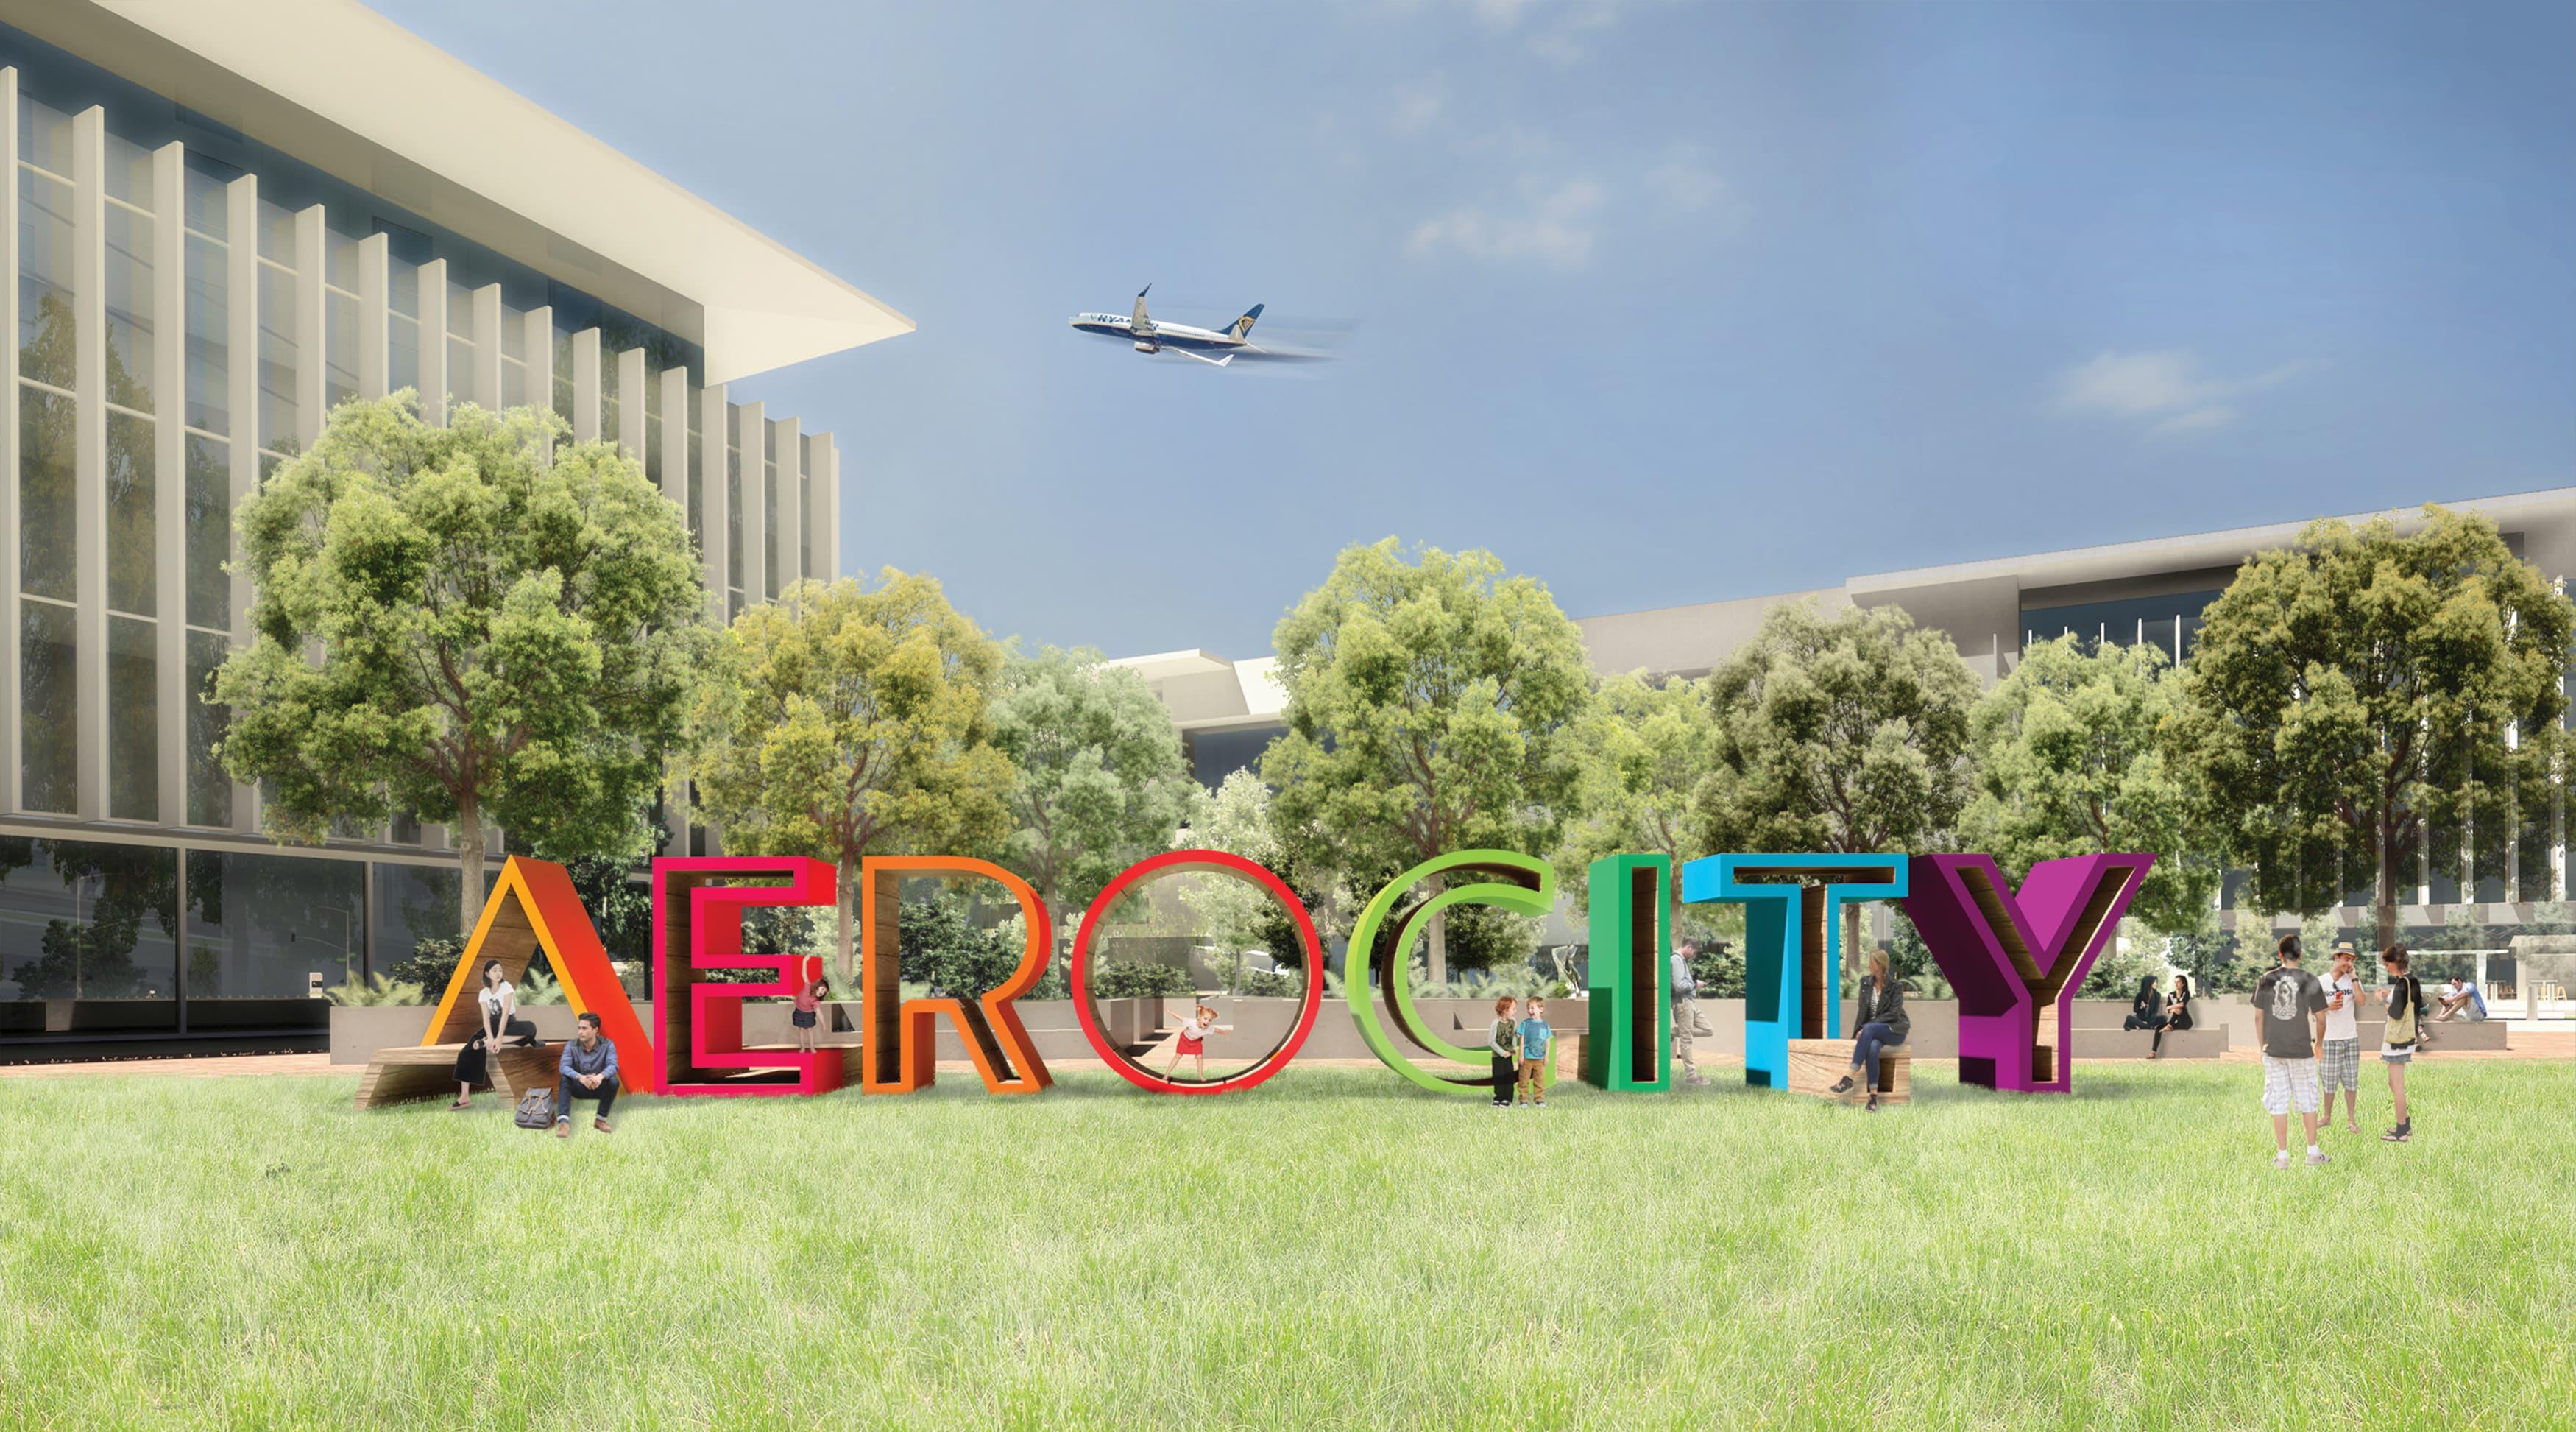 Aerocity, New Dehli, India, interactive branded project identity monument